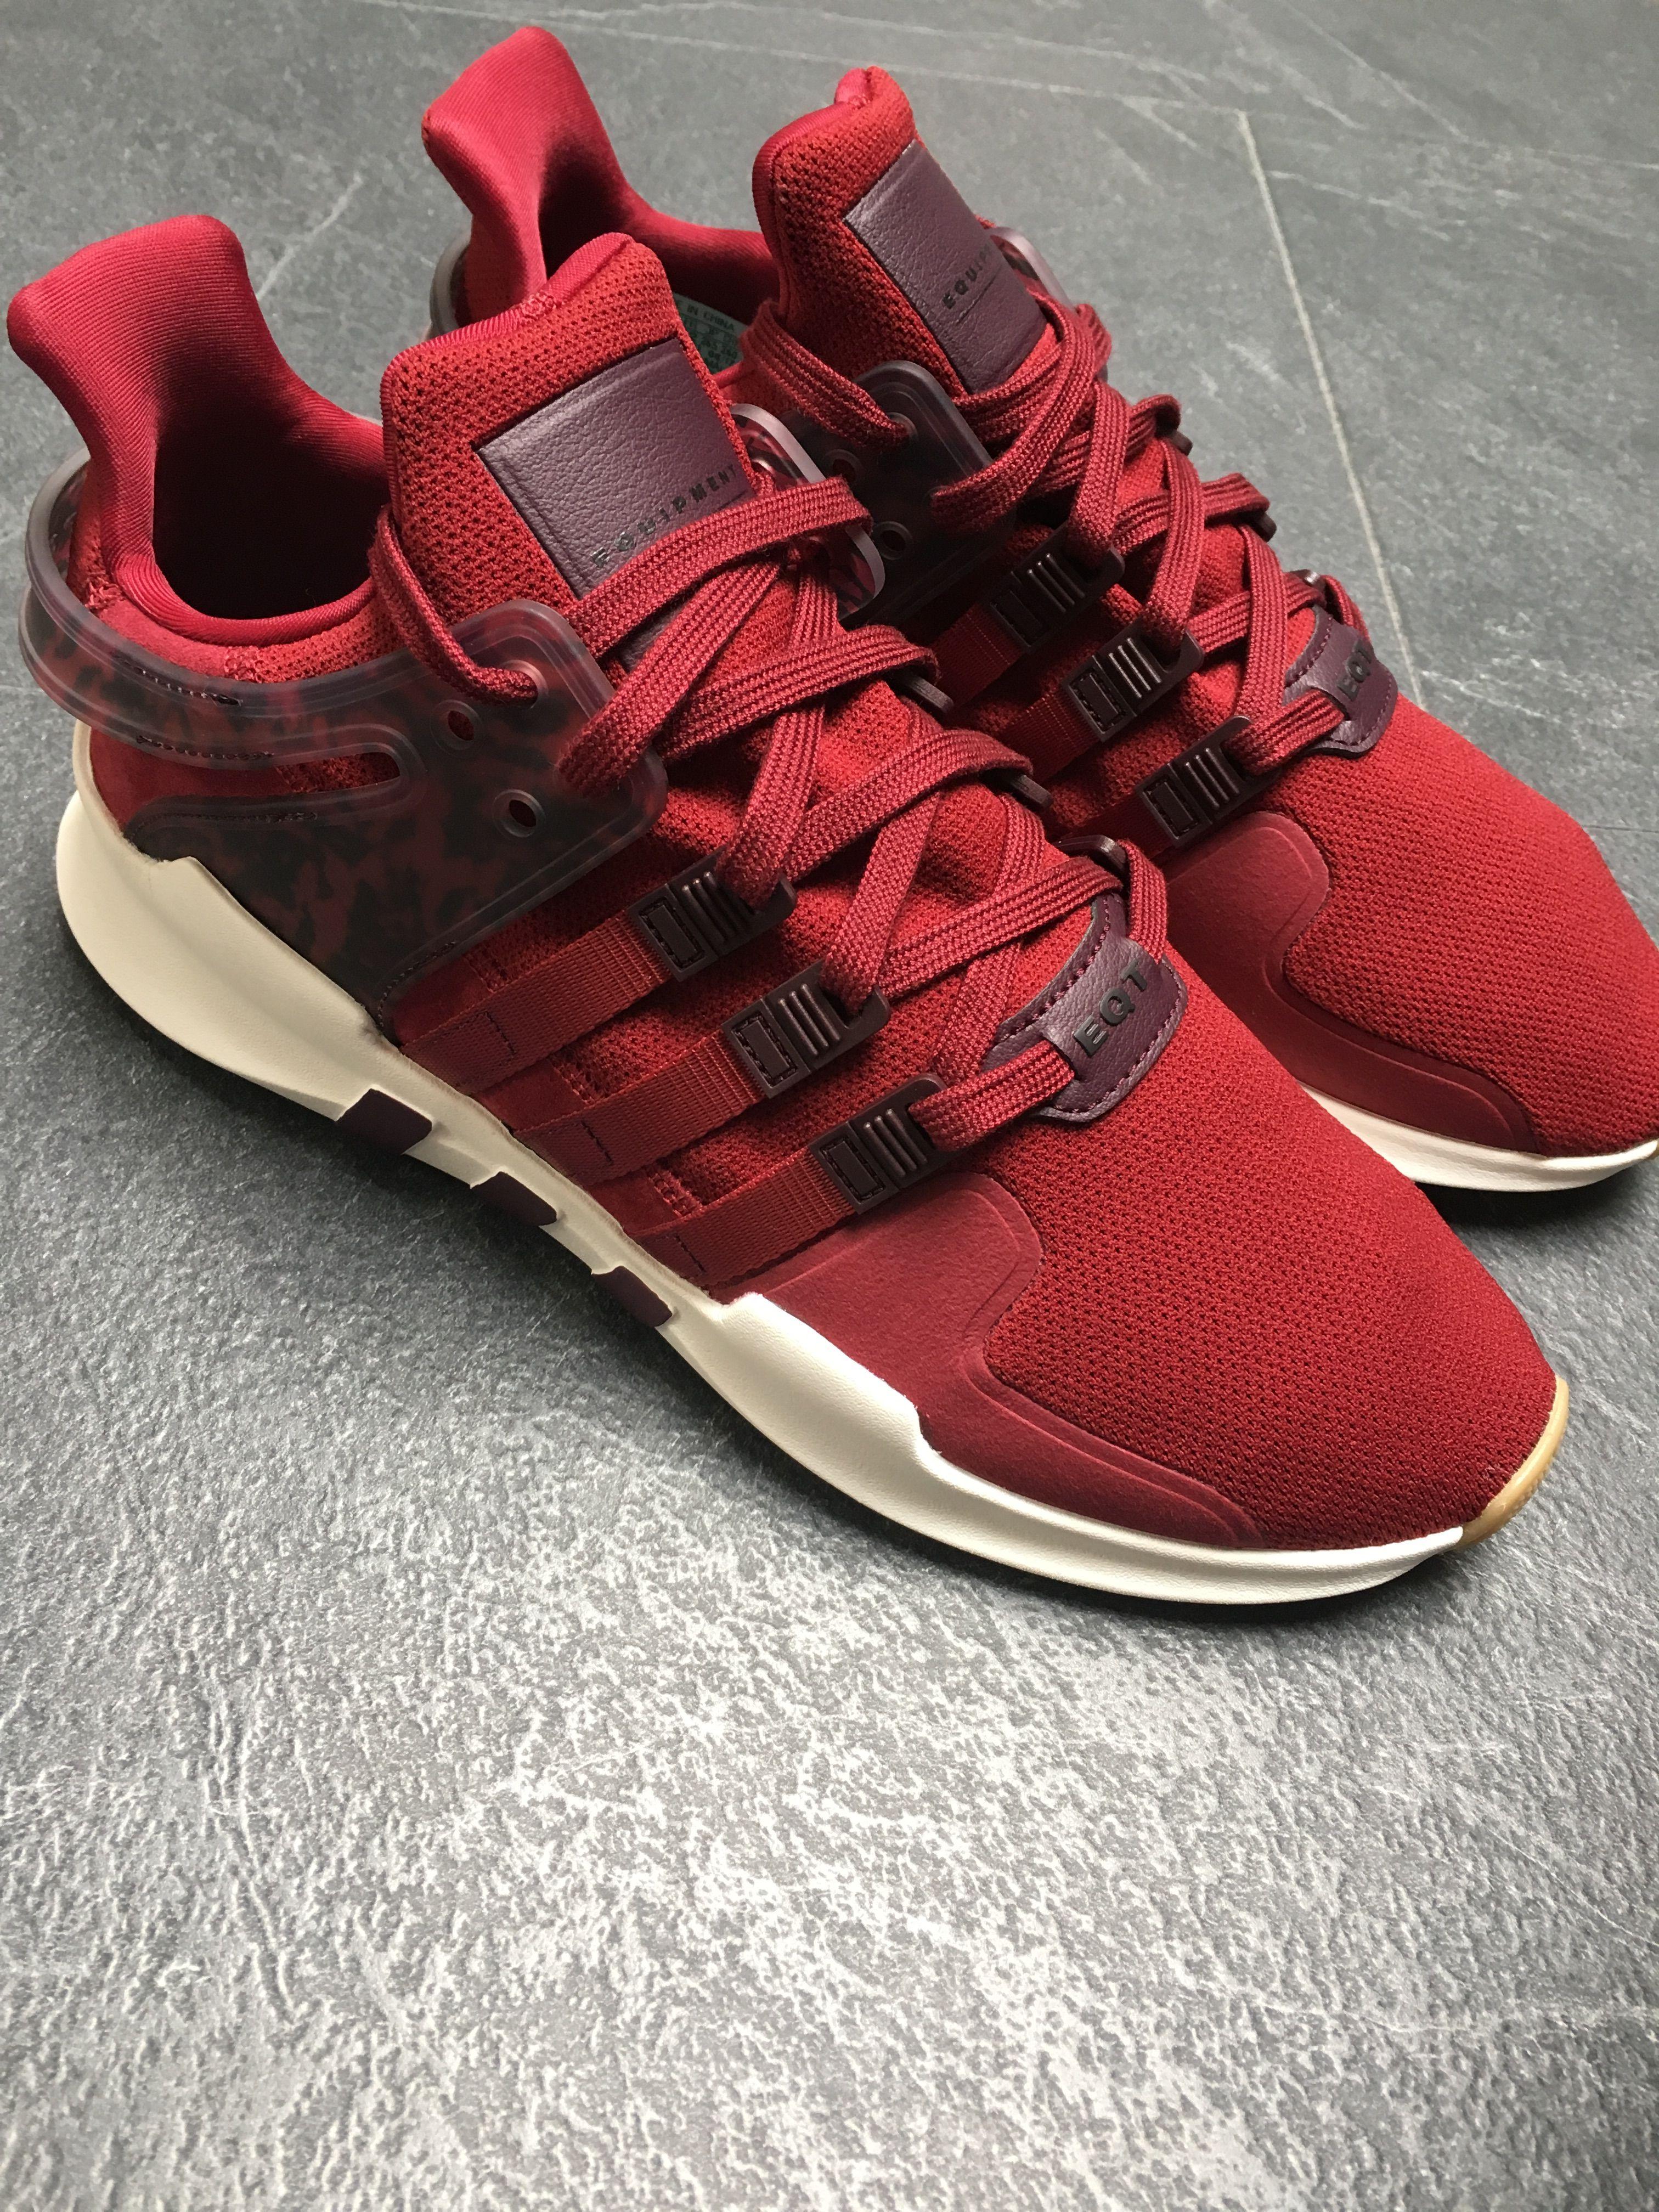 adidas Originals Equipment Support ADV 9116 Sneaker BB6479